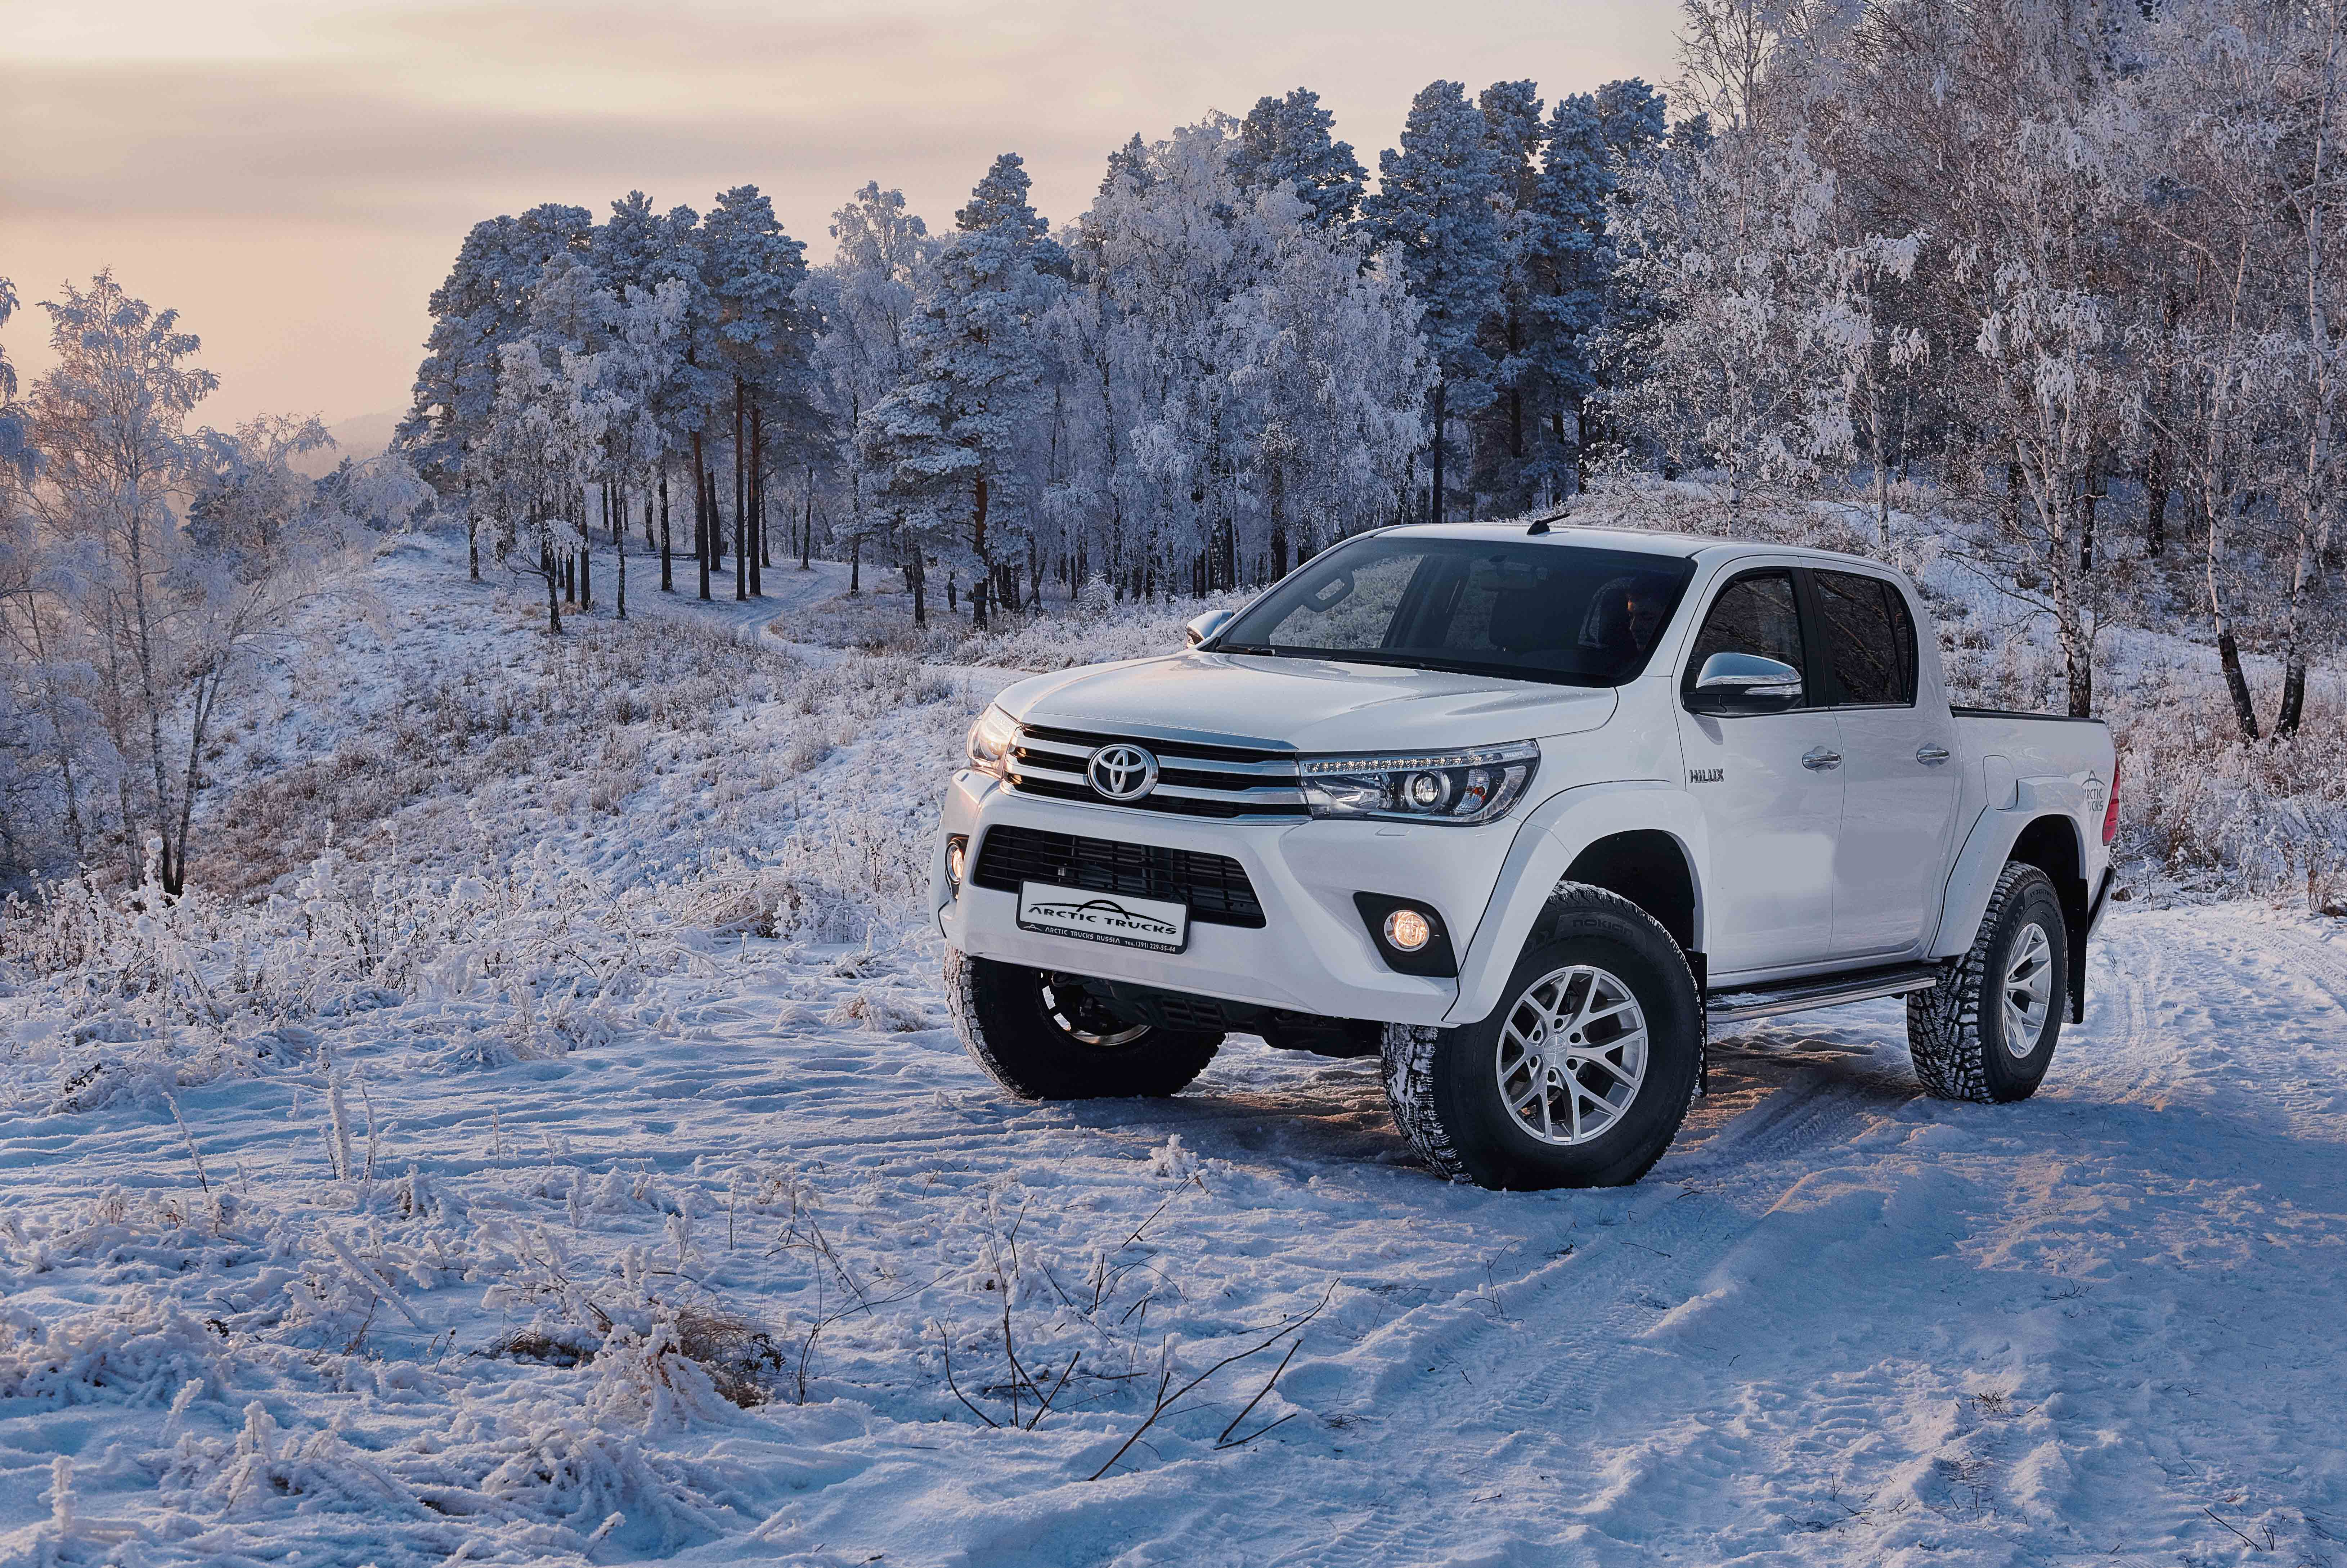 toyota-hilux-arctic-trucks-at35-snowscape-1